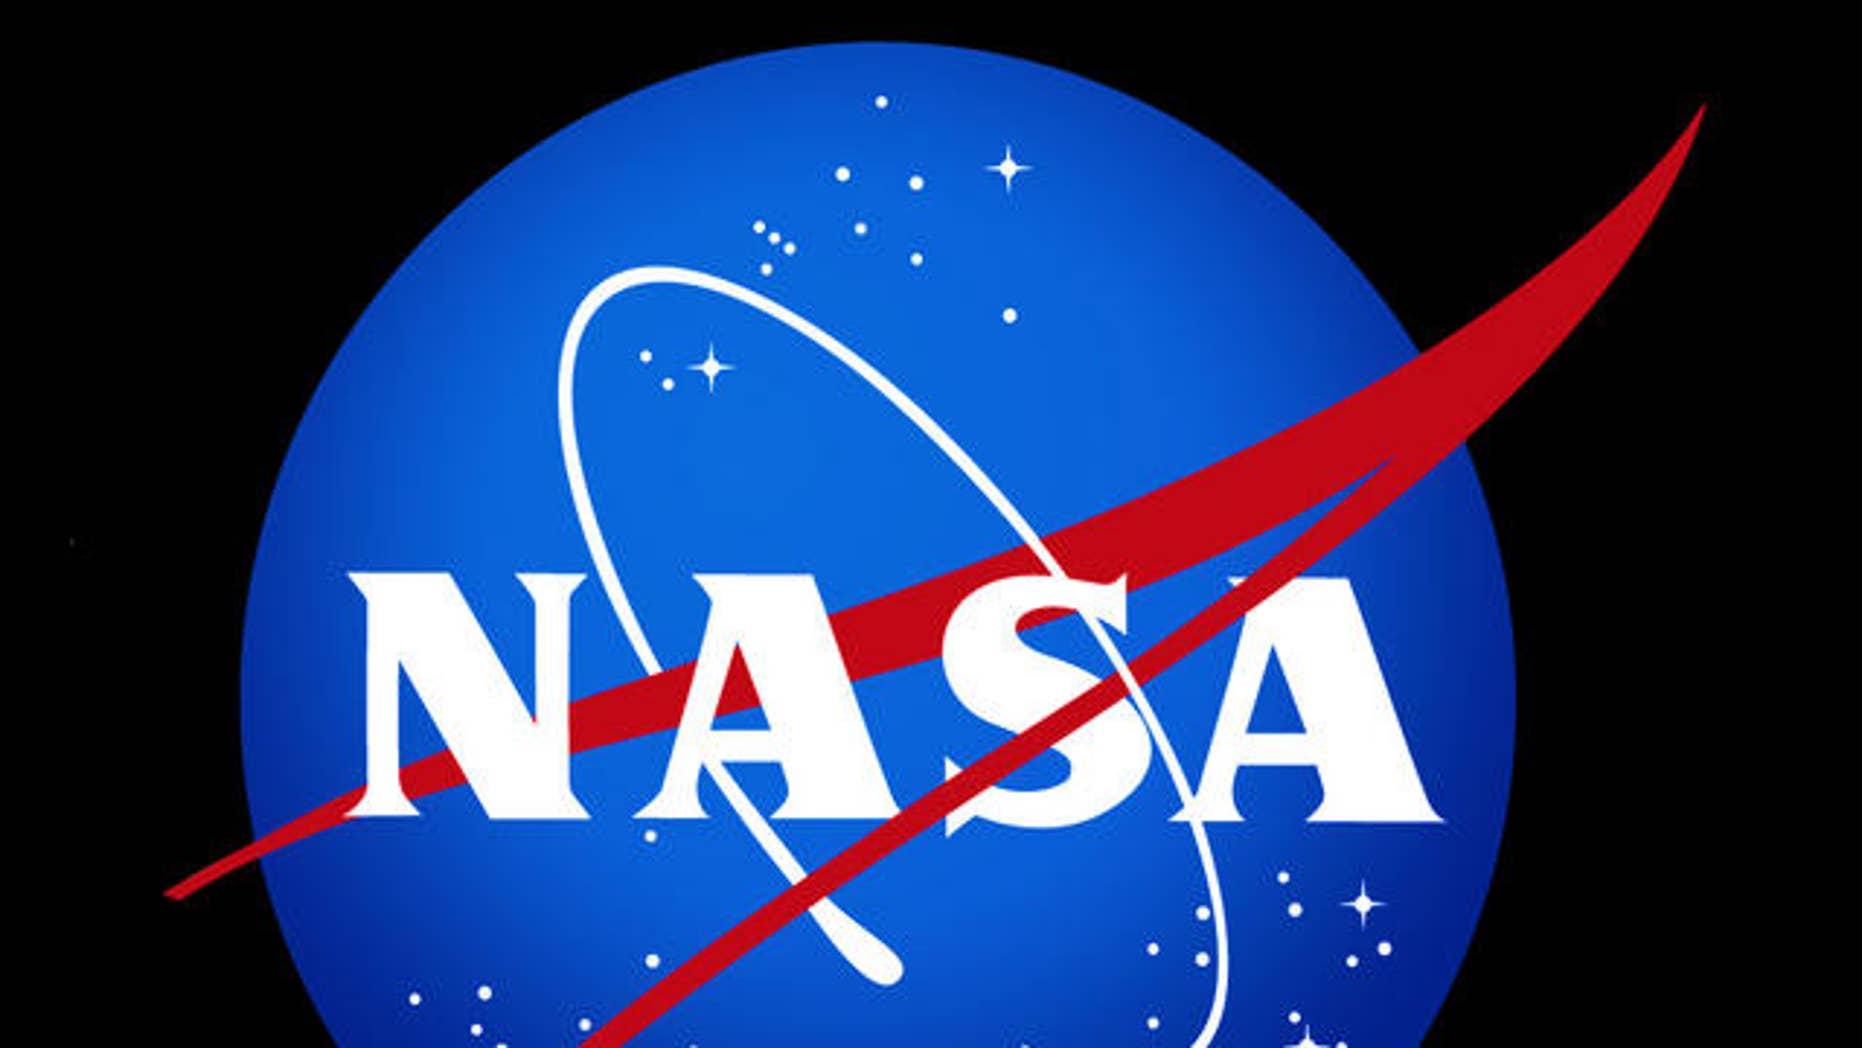 Westlake Legal Group nasa_logo What I taught 60,000 NASA employees about cybersecurity The Kim Komando Show Kim Komando fox-news/tech/topics/security fox-news/science/air-and-space/nasa fnc/tech fnc article 061f2c88-4d19-5193-8c62-f94f5f92de85